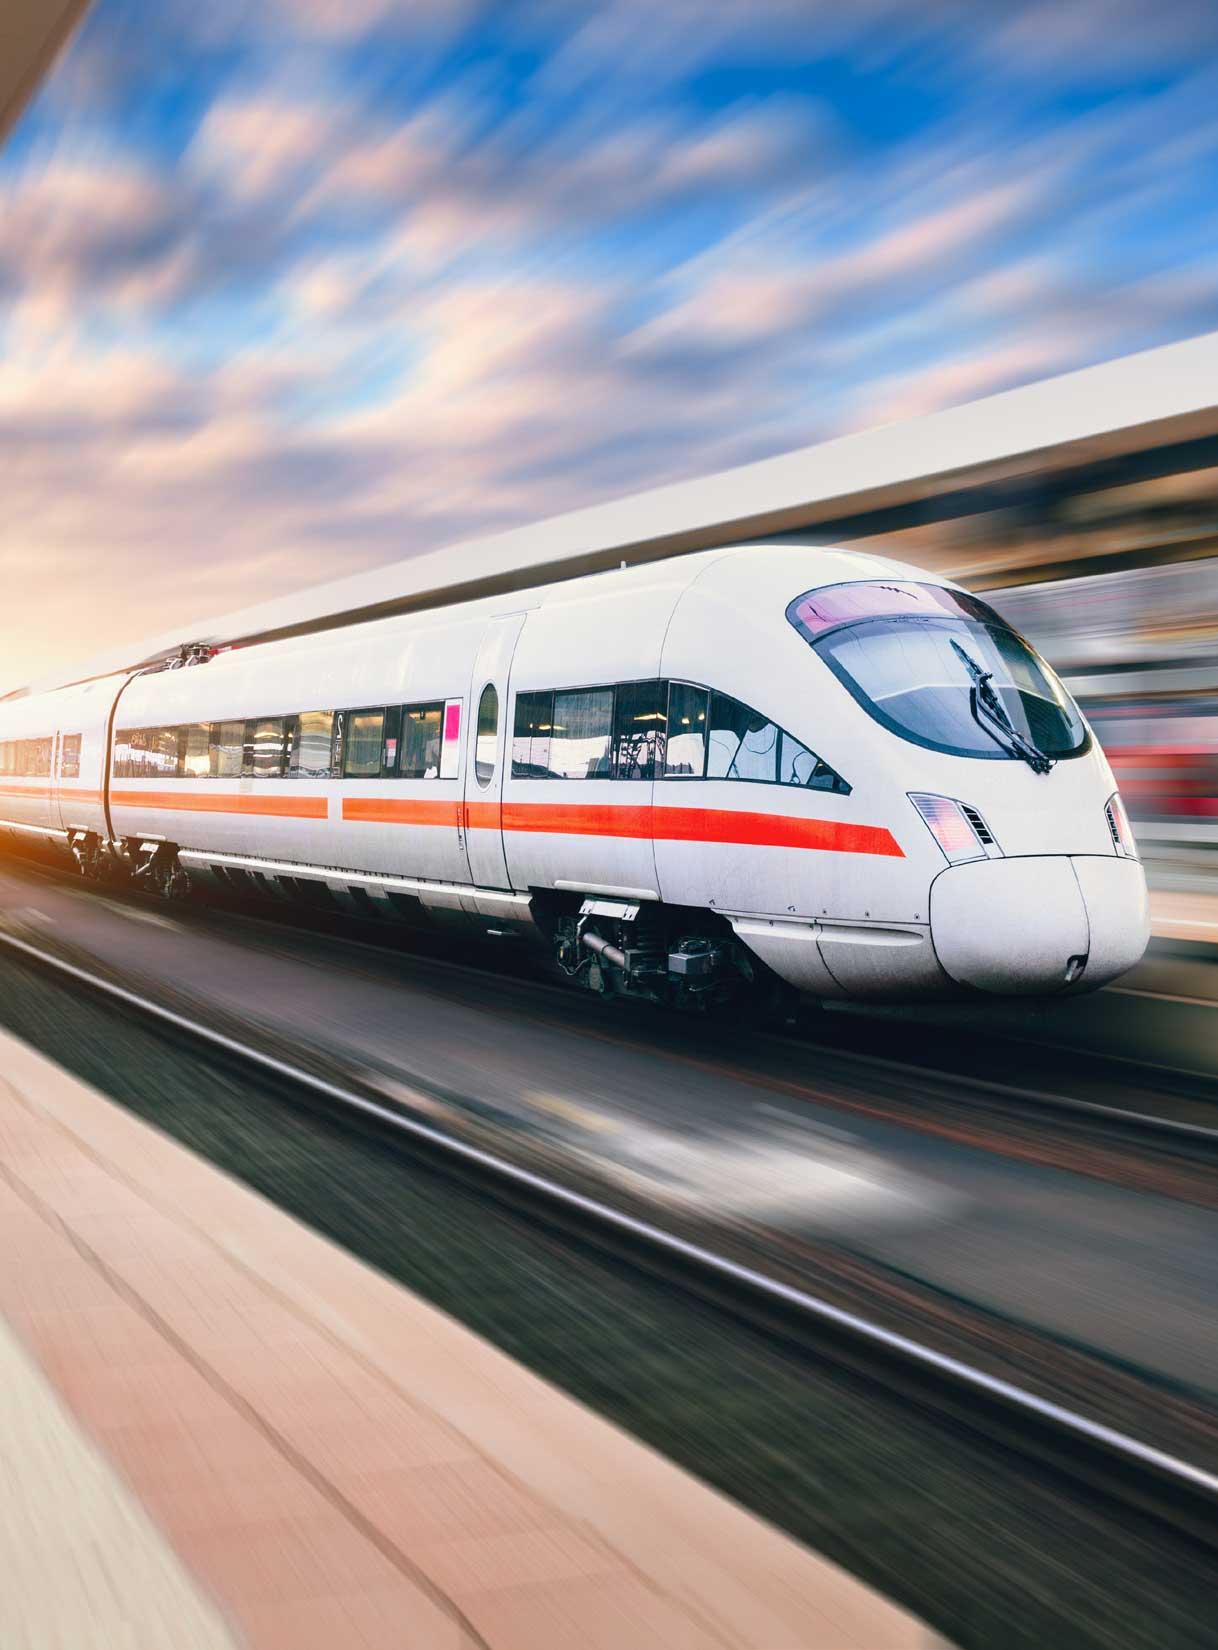 Digital Operations Analytics Enables Predictive Maintenance for a Major Railroad Company